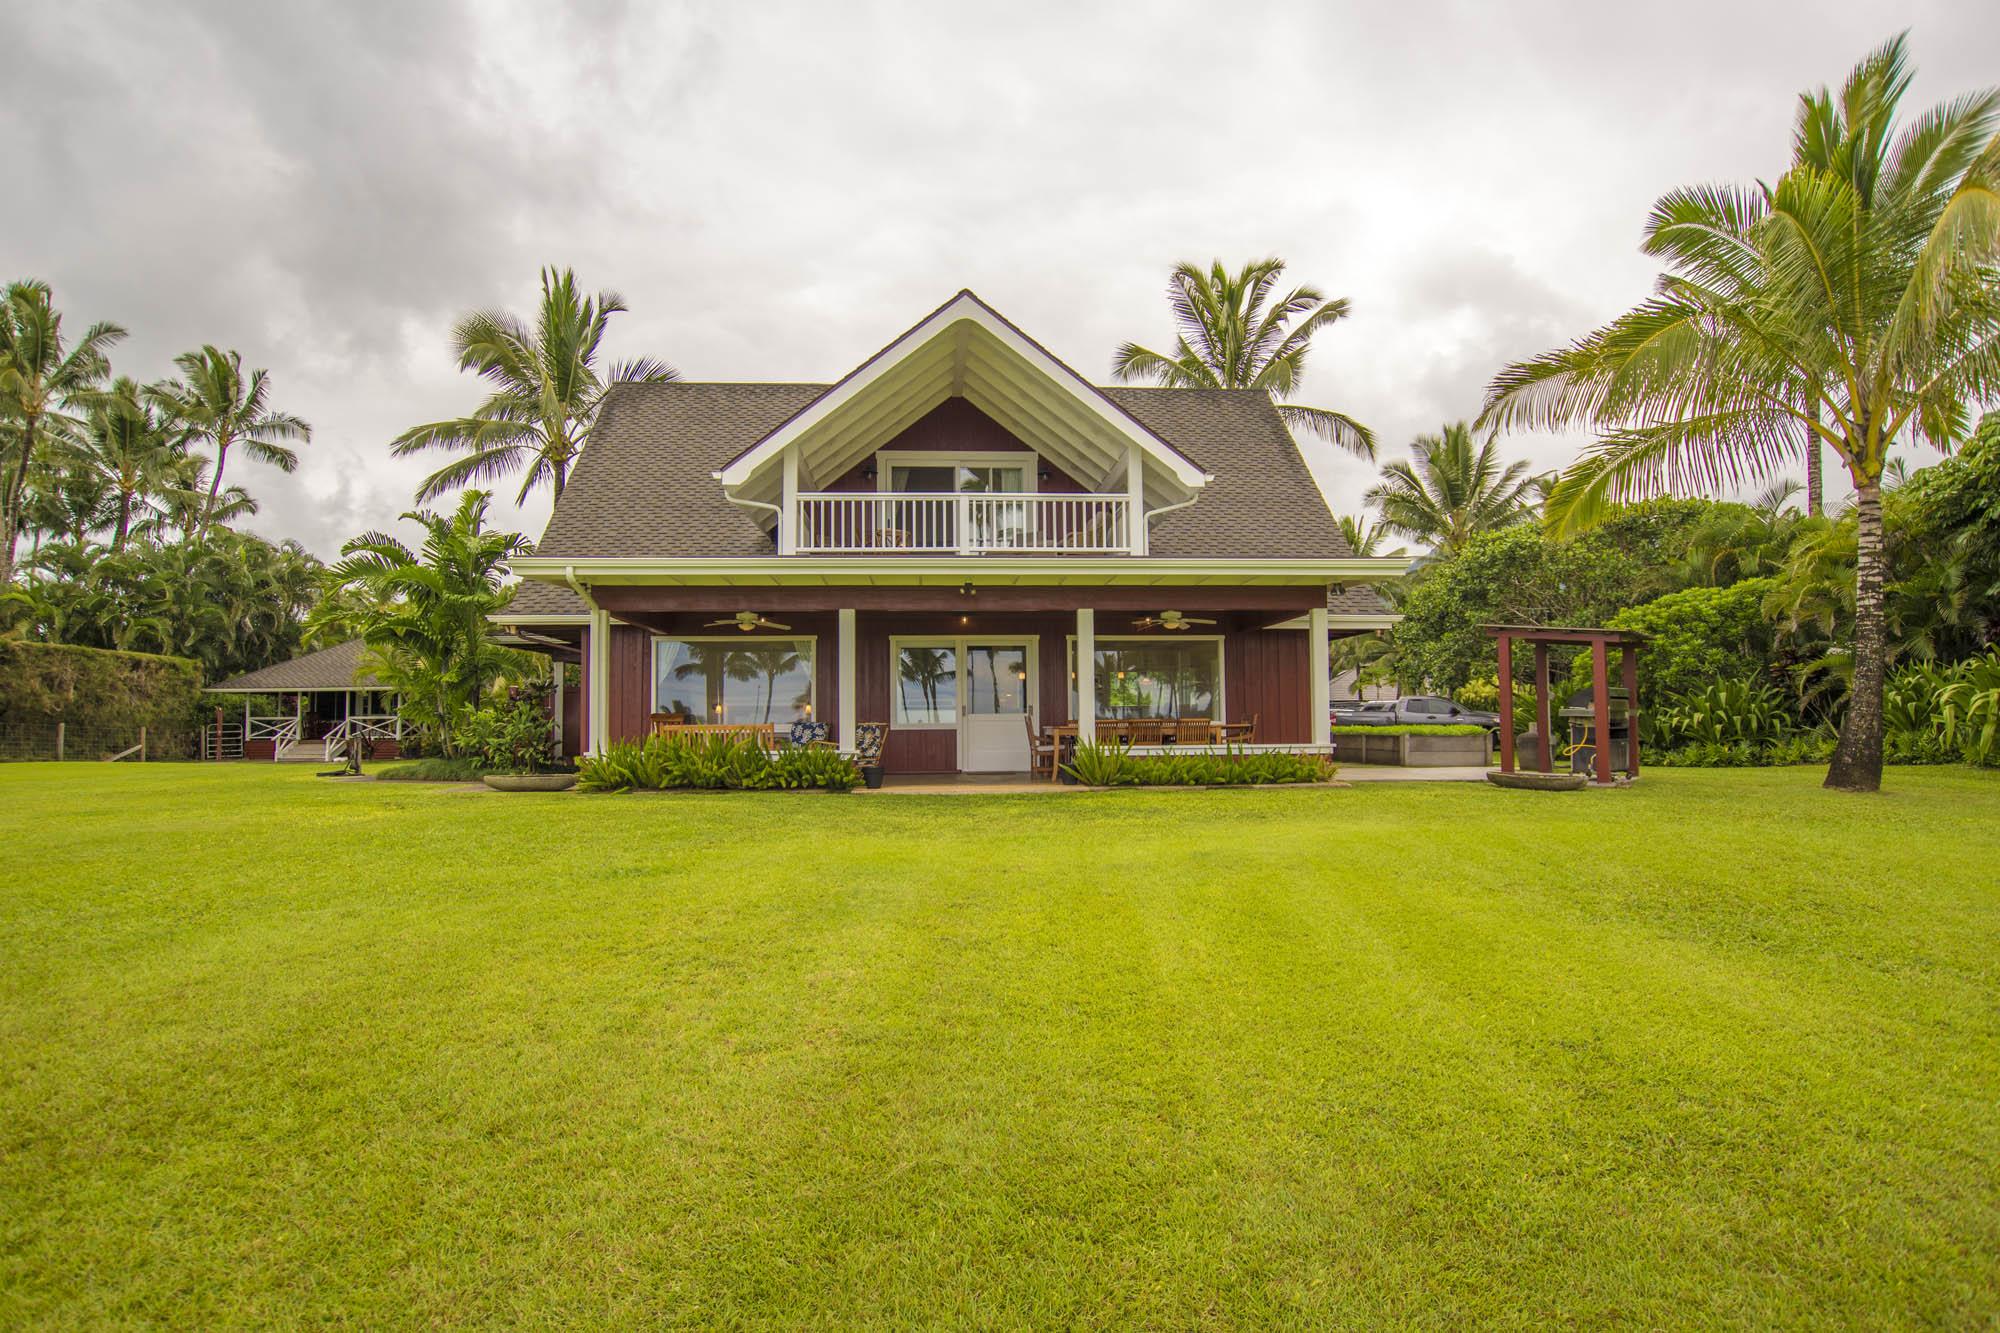 Kauai-217-Hanalei Bay5